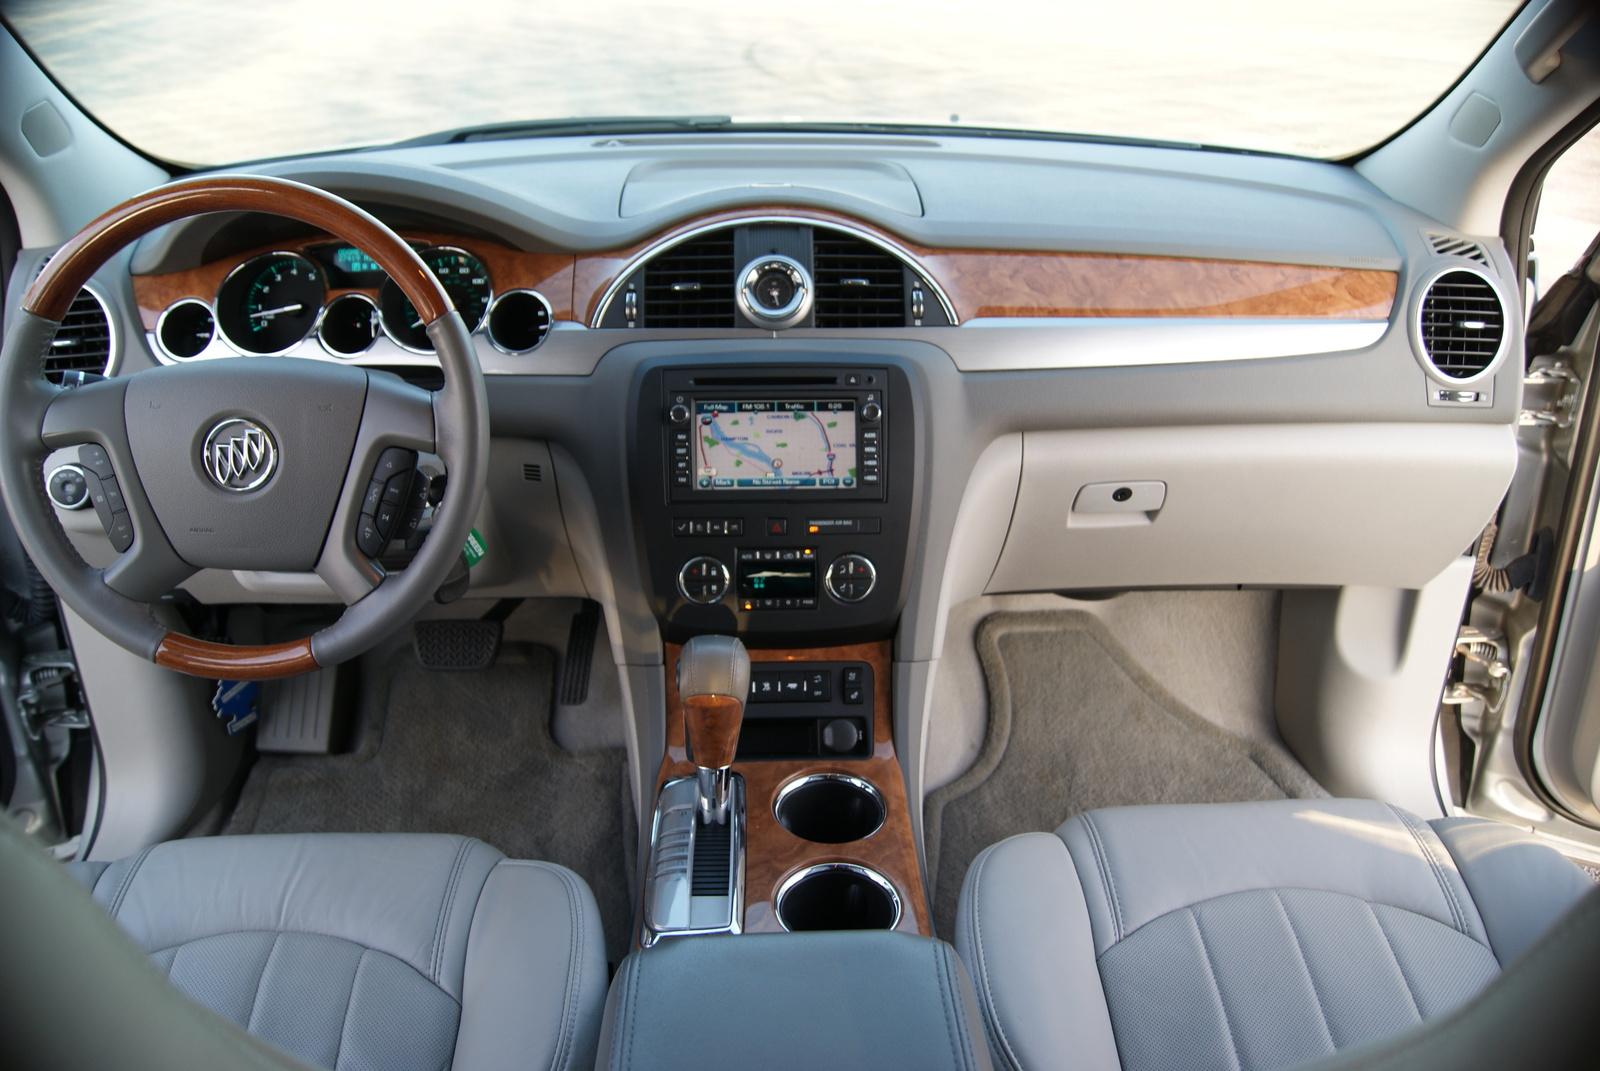 2012 Buick Enclave Pictures Cargurus